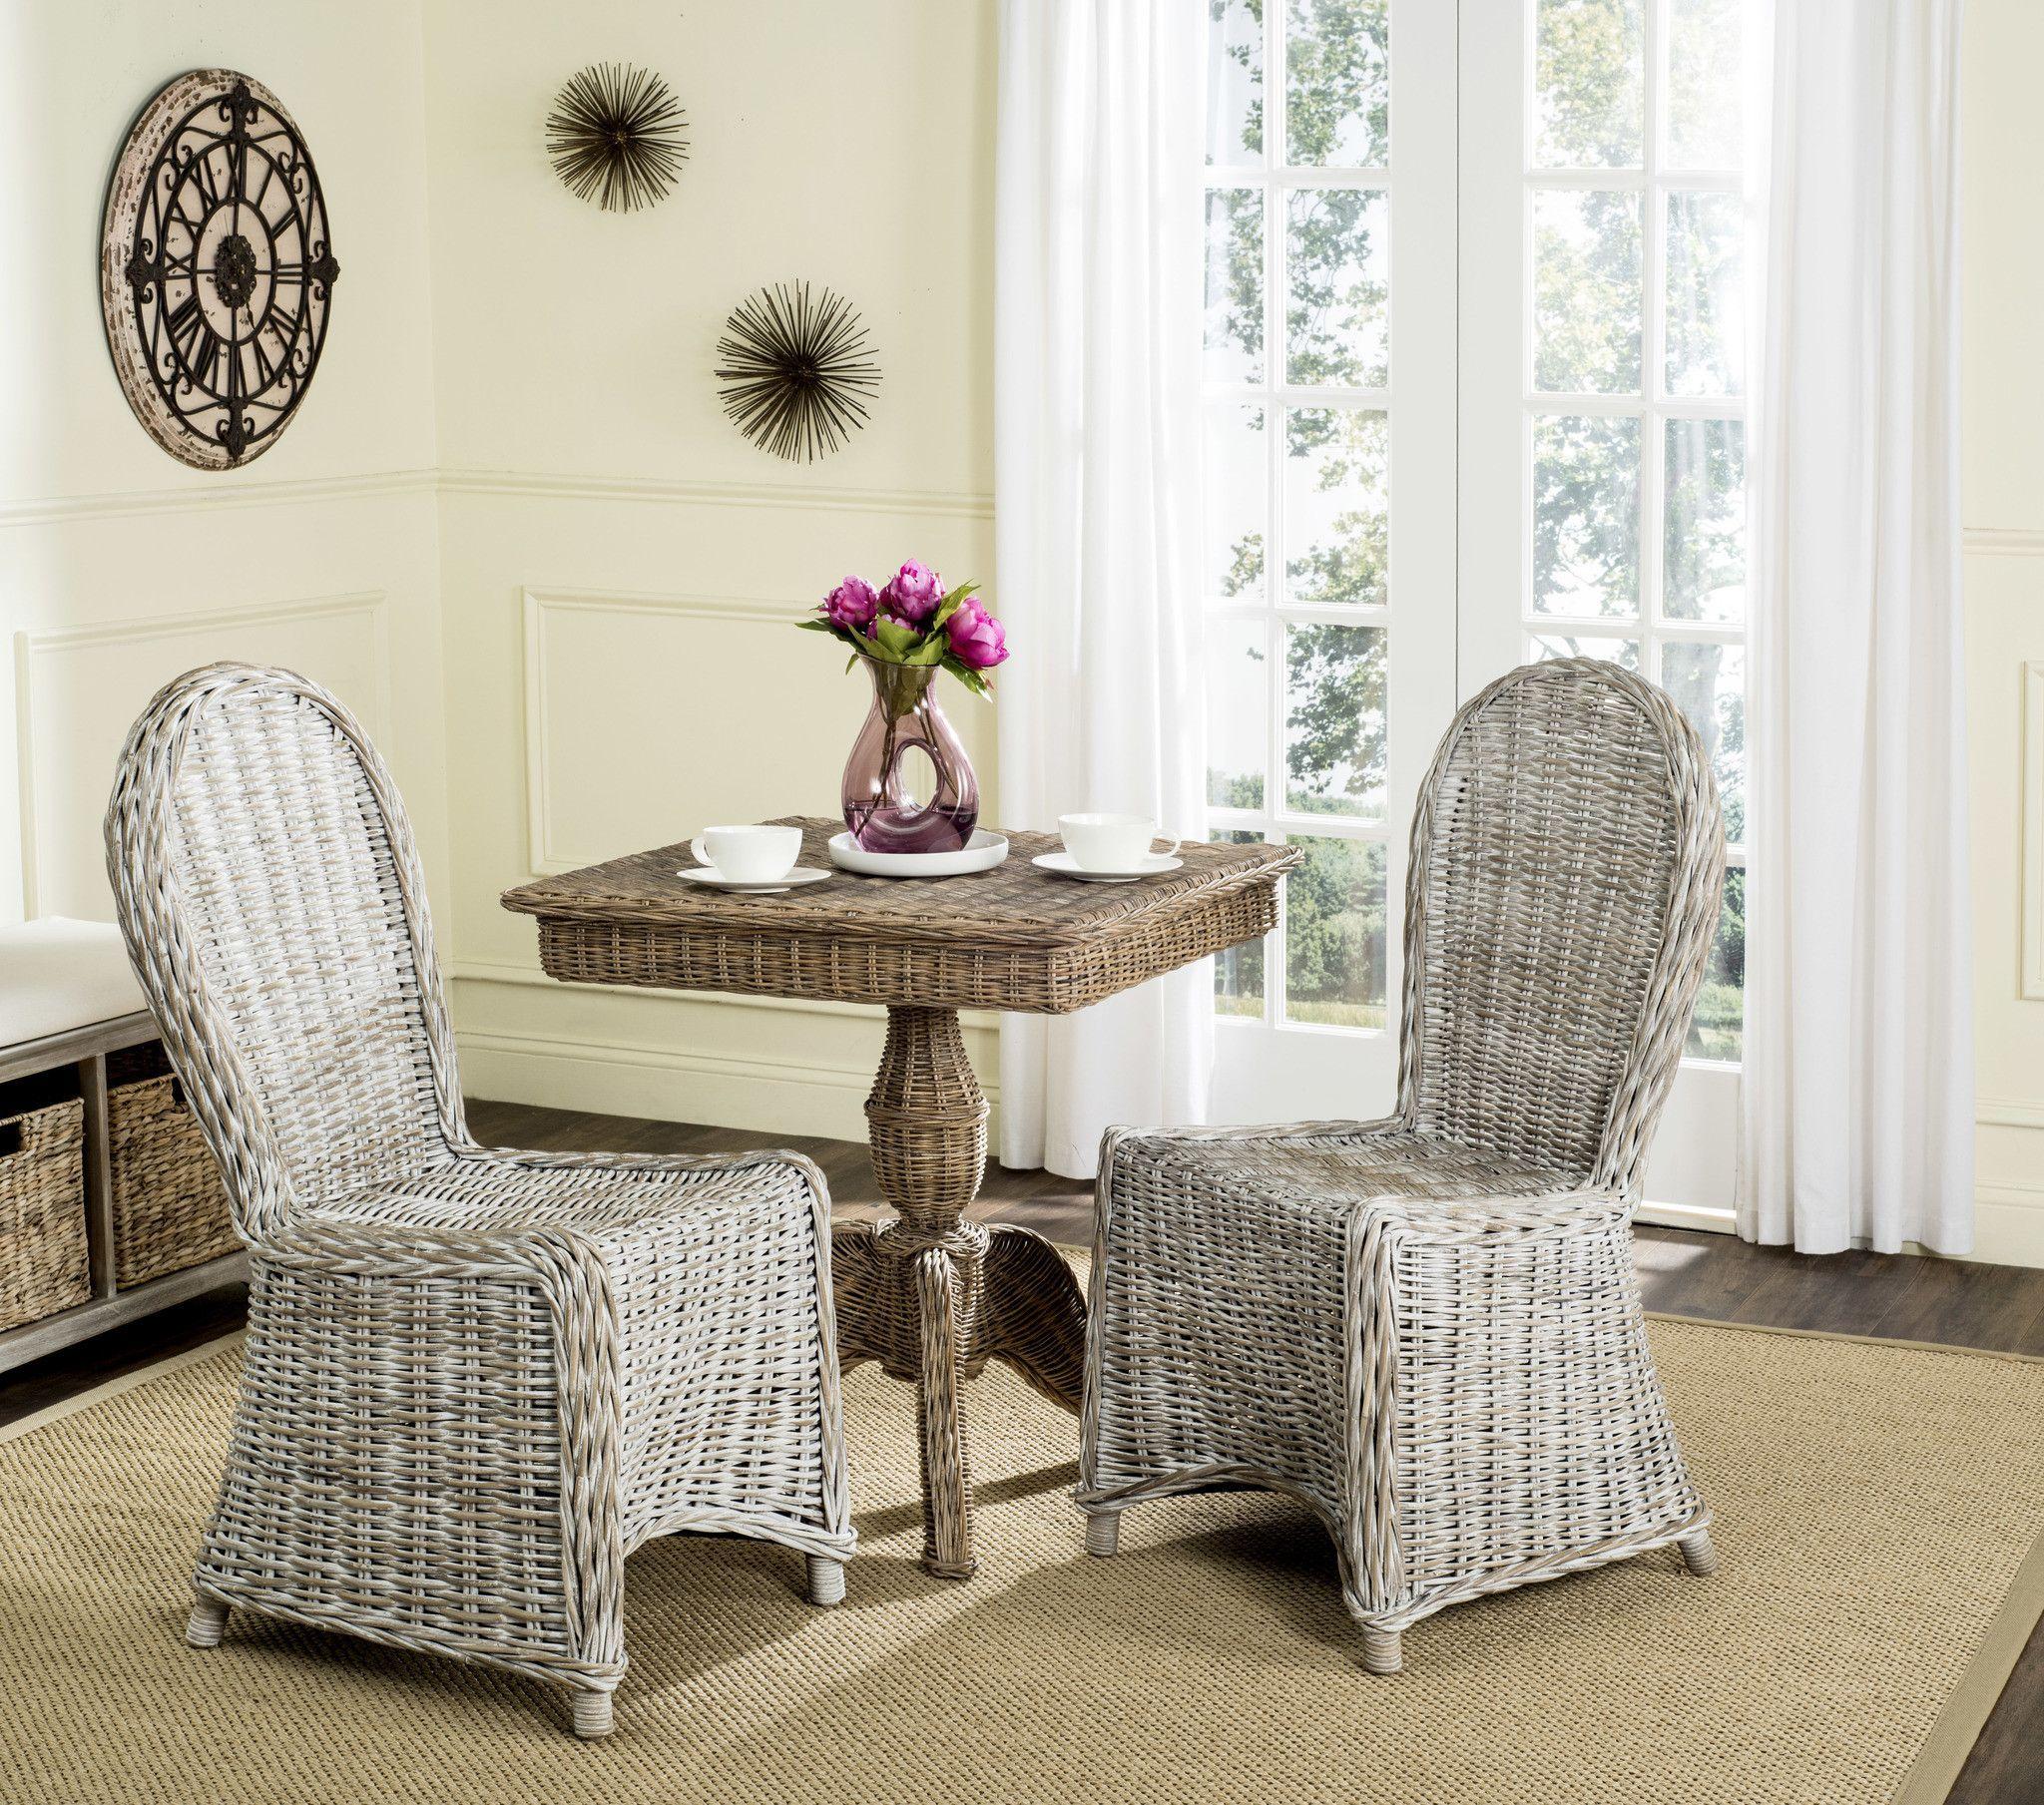 Safavieh Idola Wicker Dining Chair, Set of 2 | Wicker dining chairs ...